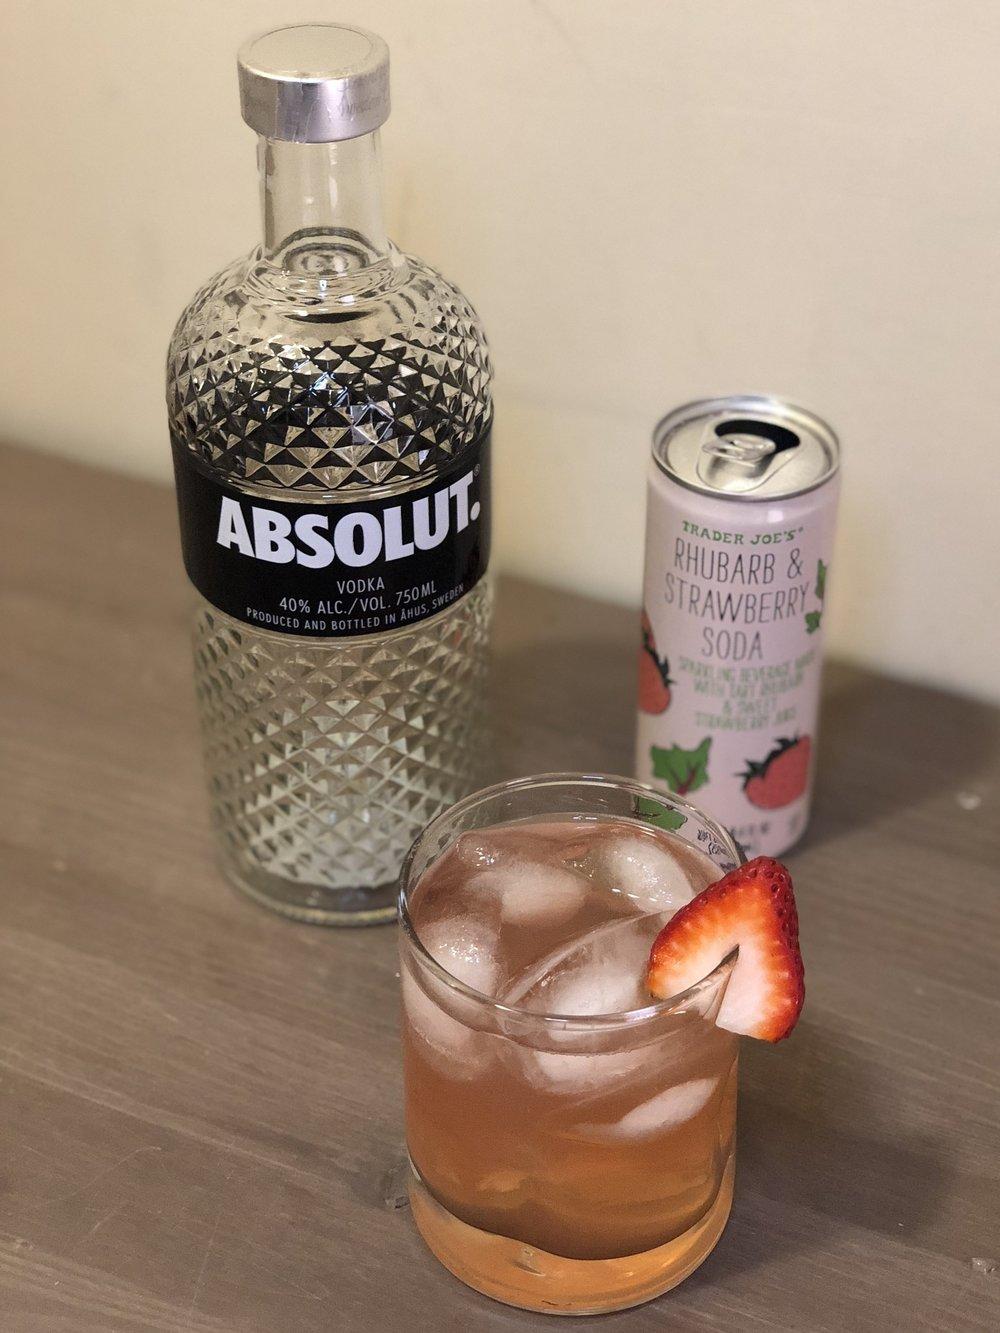 AAY Nutrition Trader Rhubarb-Strawberry Vodka Fizz